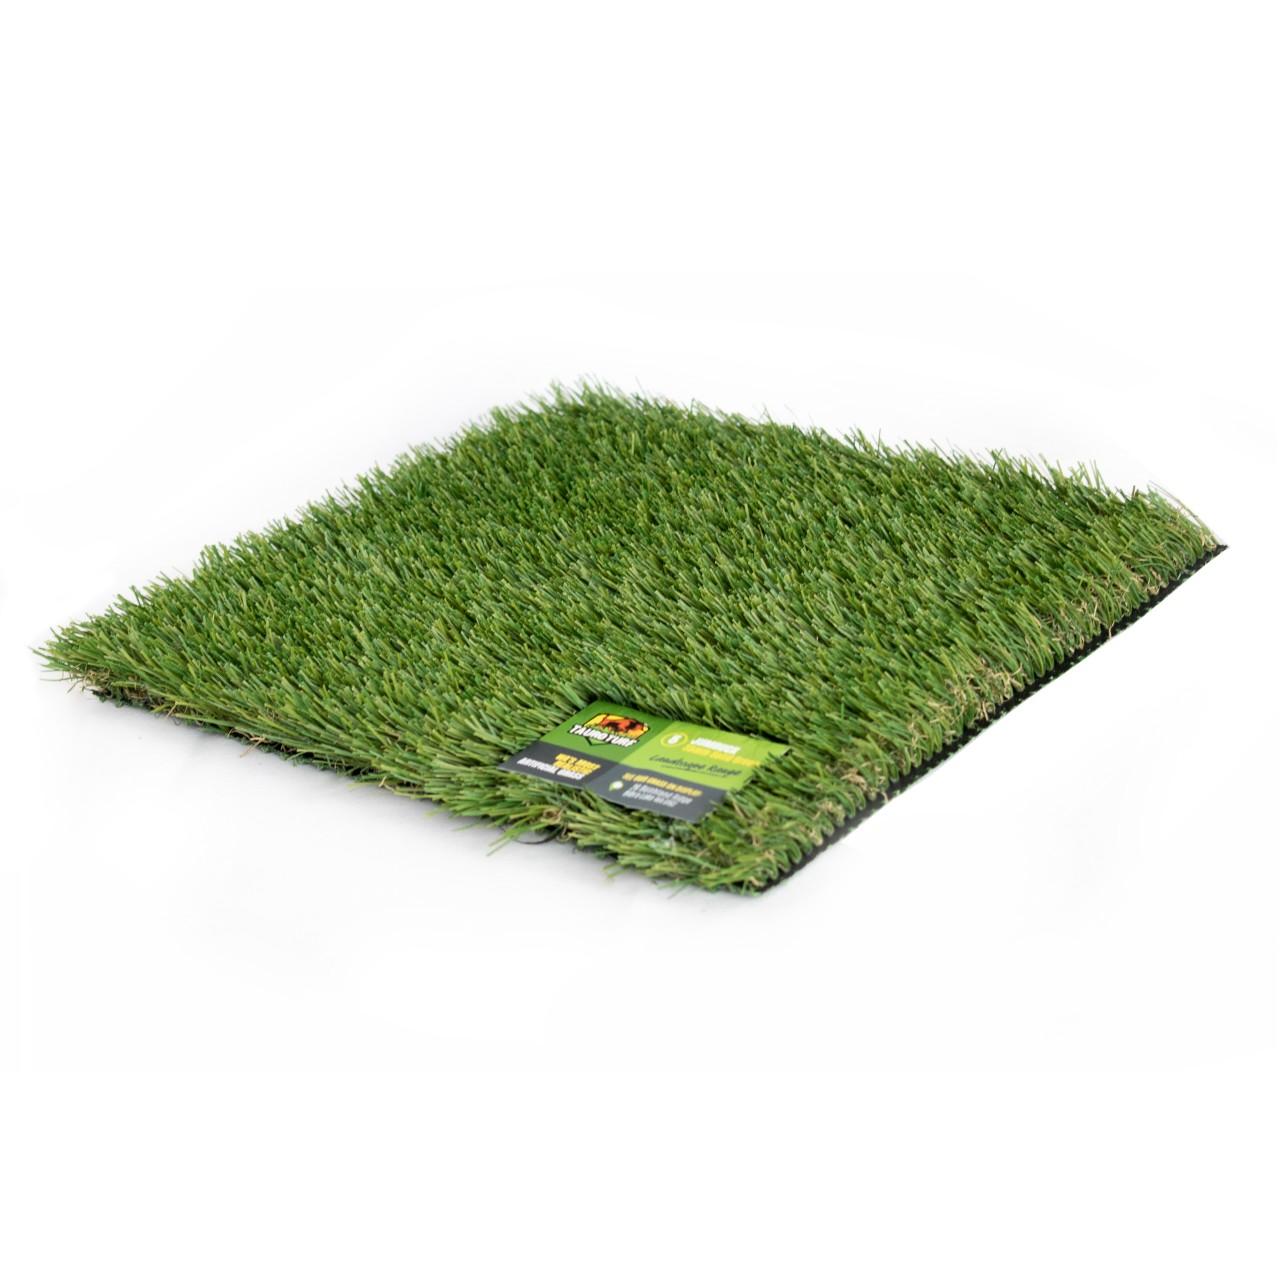 Jumbuck grass image